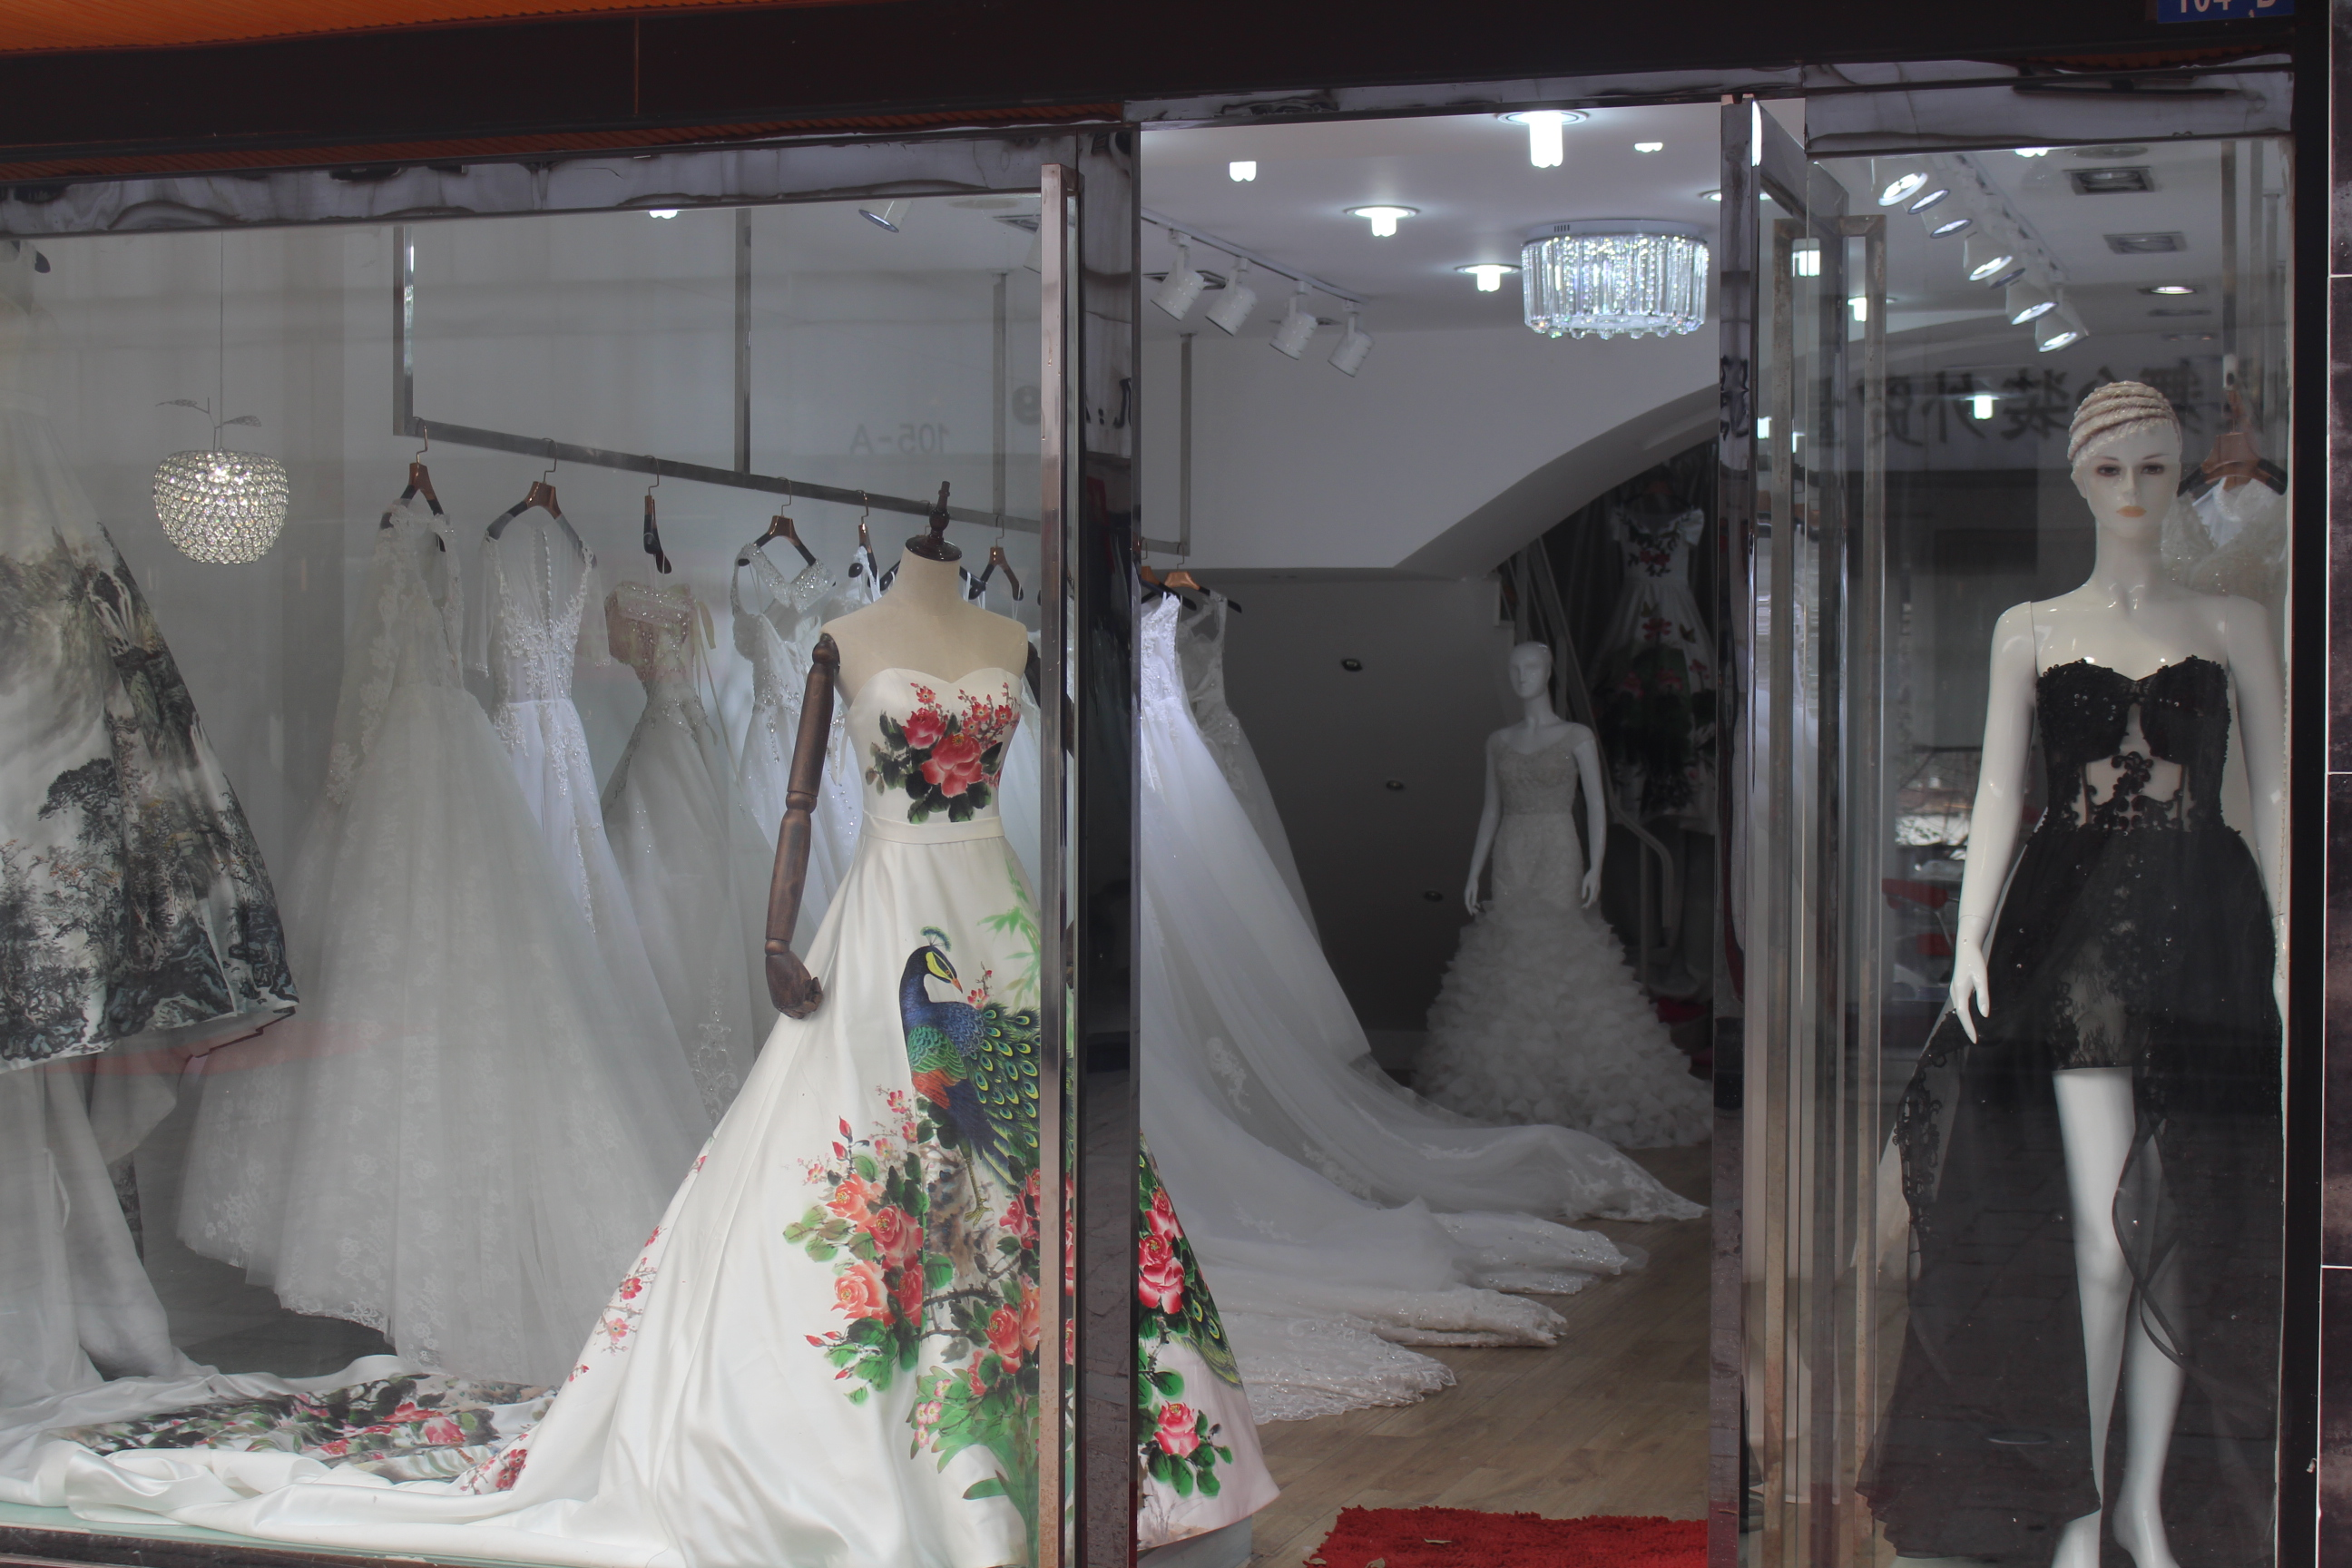 File:Wedding Dress Shop.jpg - Wikimedia Commons